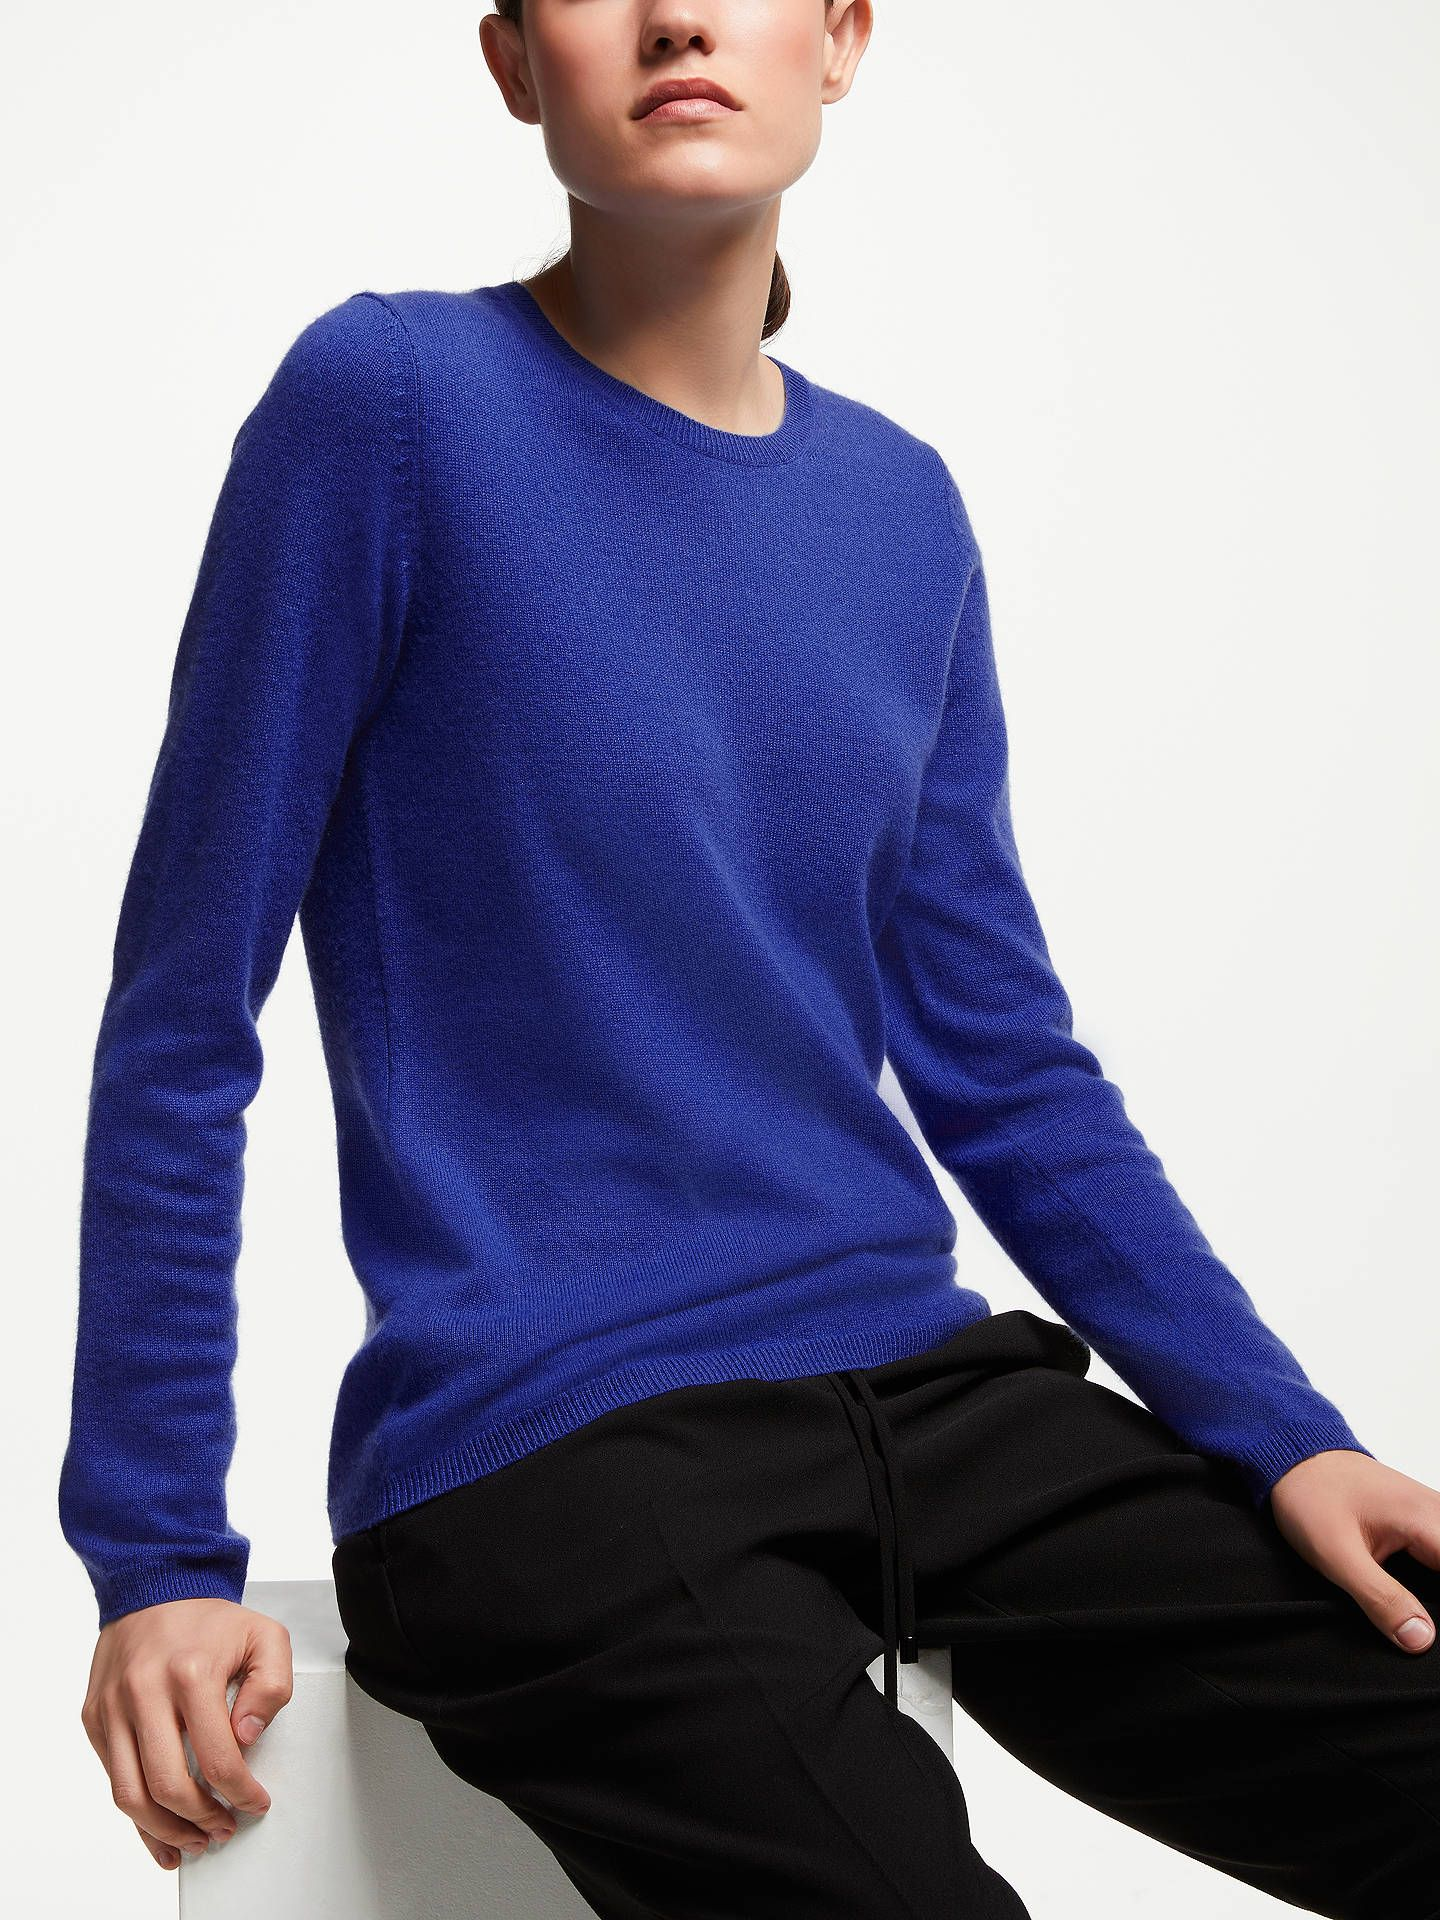 John Lewis   Partners Cashmere Crew Neck Sweater at John Lewis   Partners 6ba6c9933